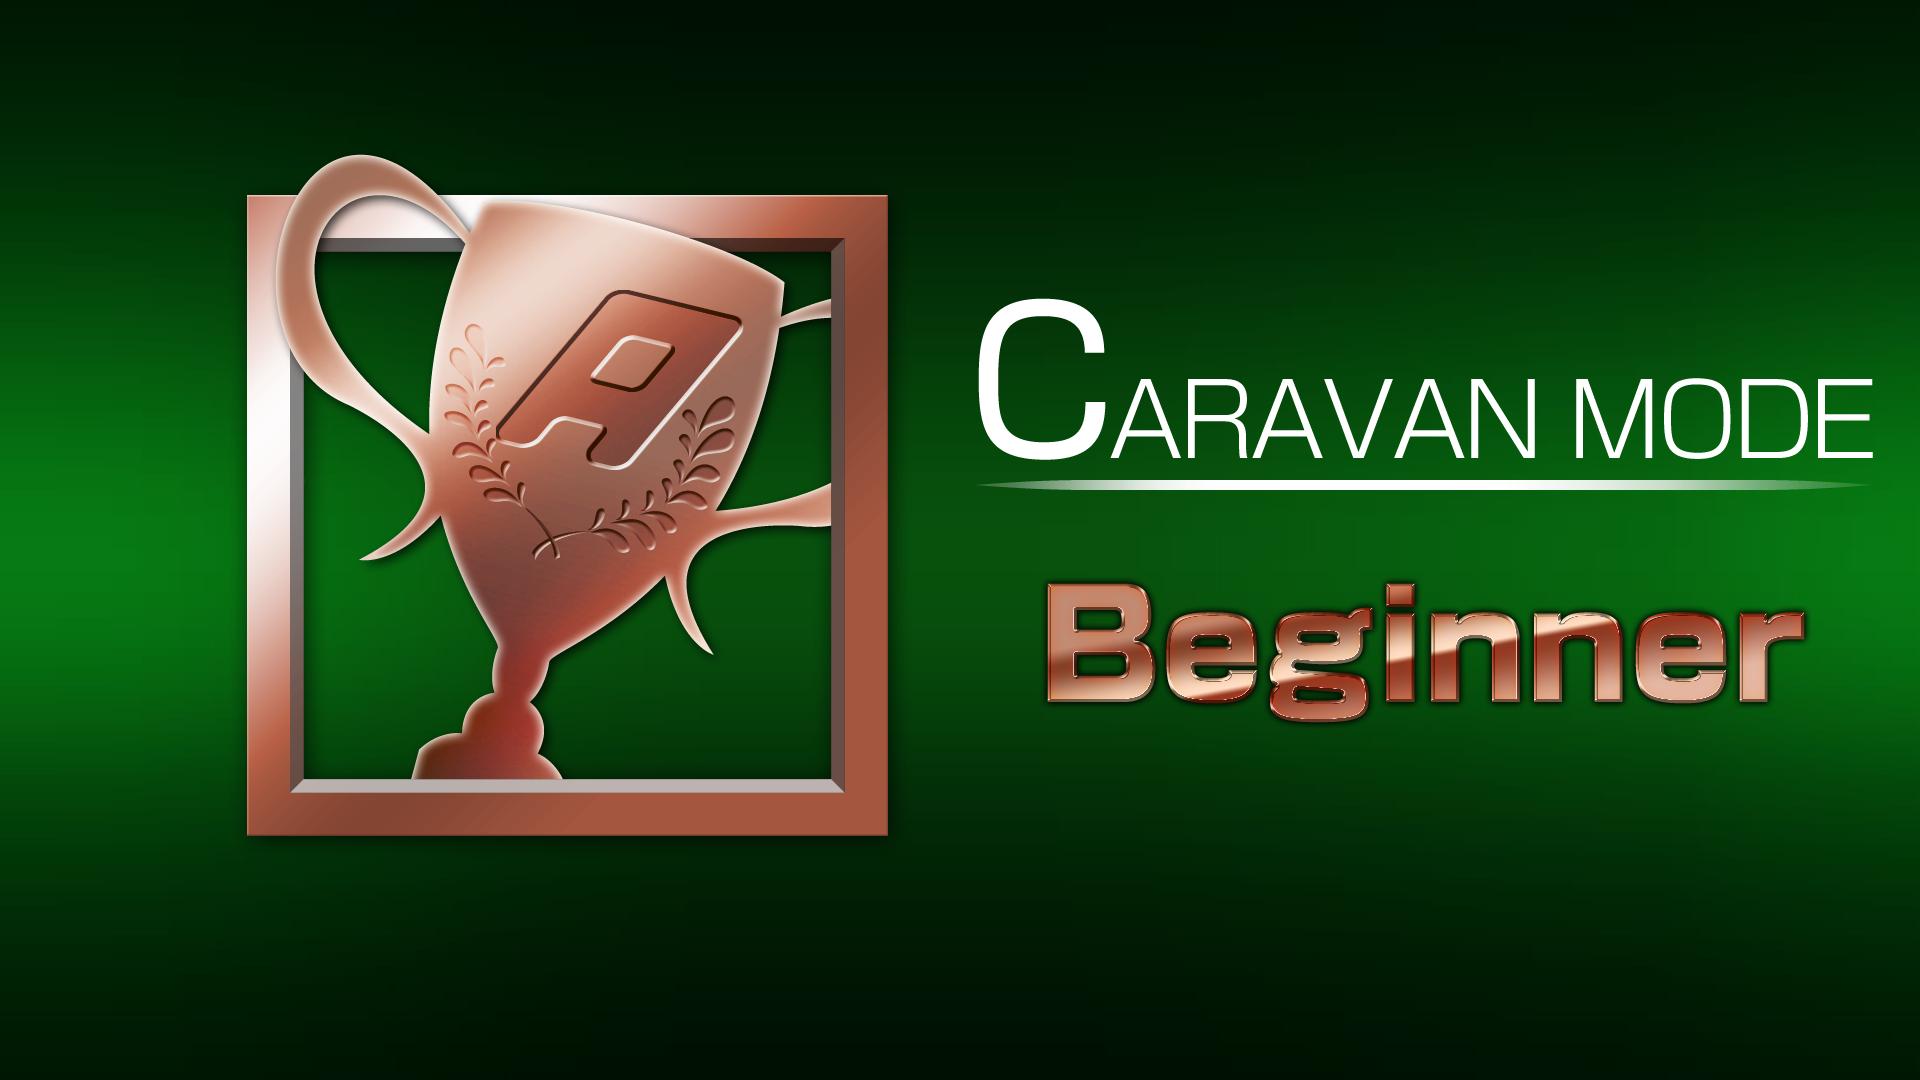 Icon for CARAVAN MODE 1 points